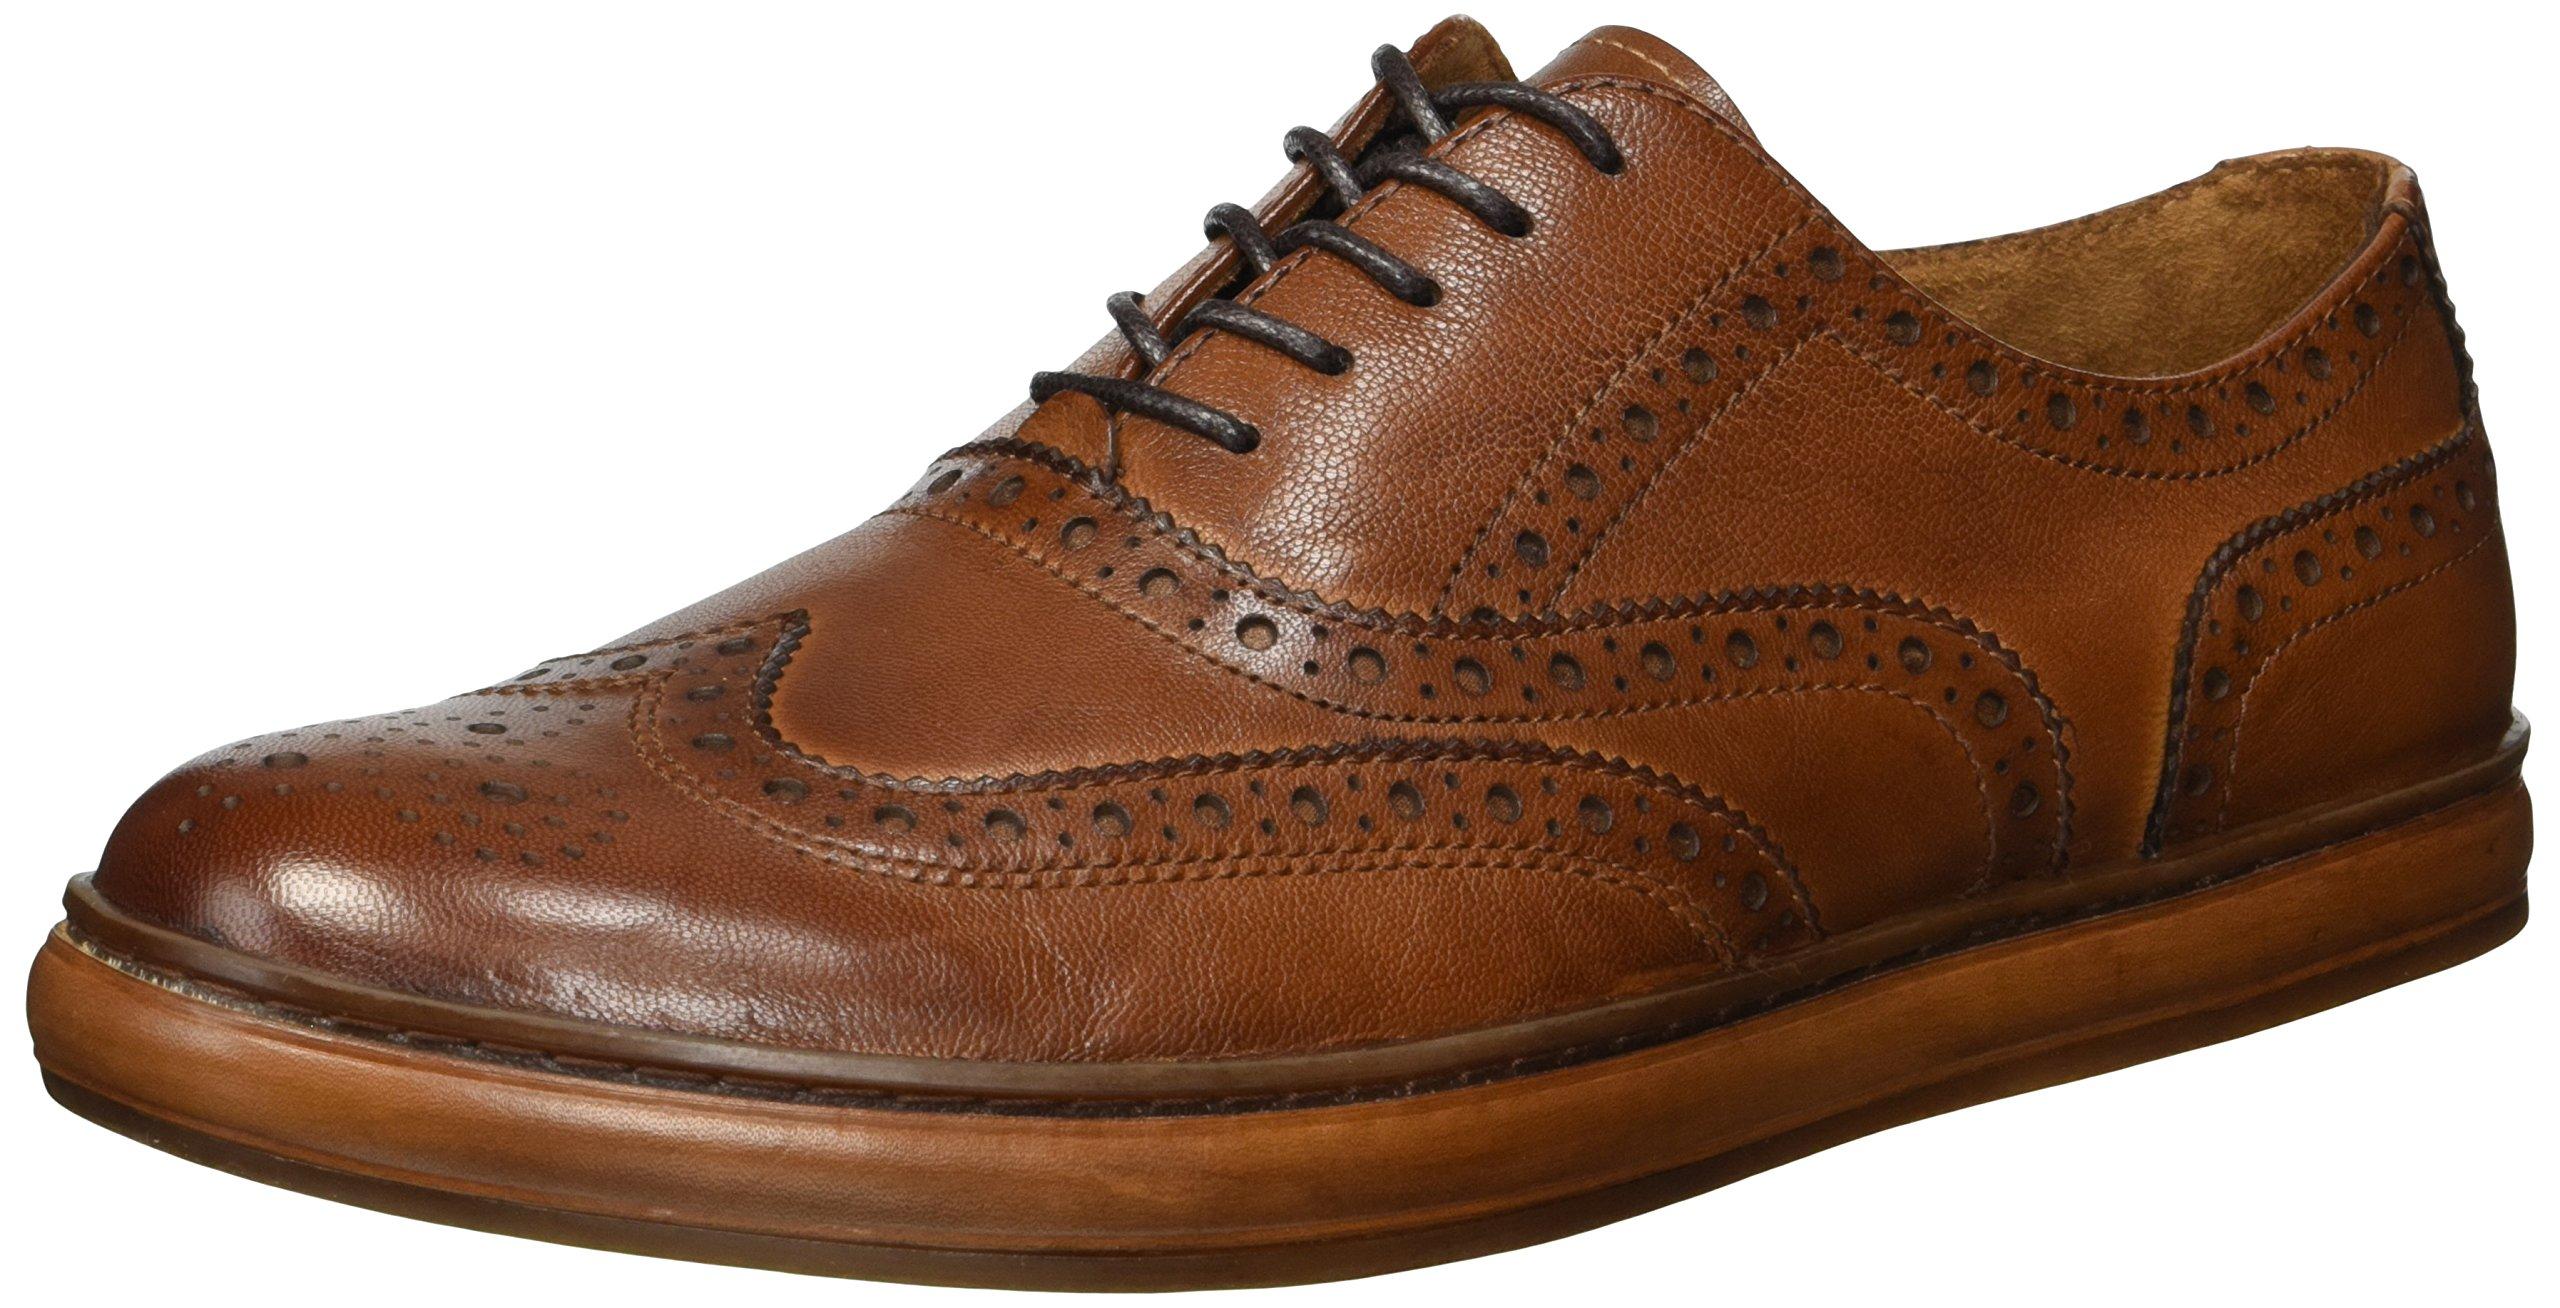 Kenneth Cole New York Men's Brand Sneaker D, Cognac, 8 M US